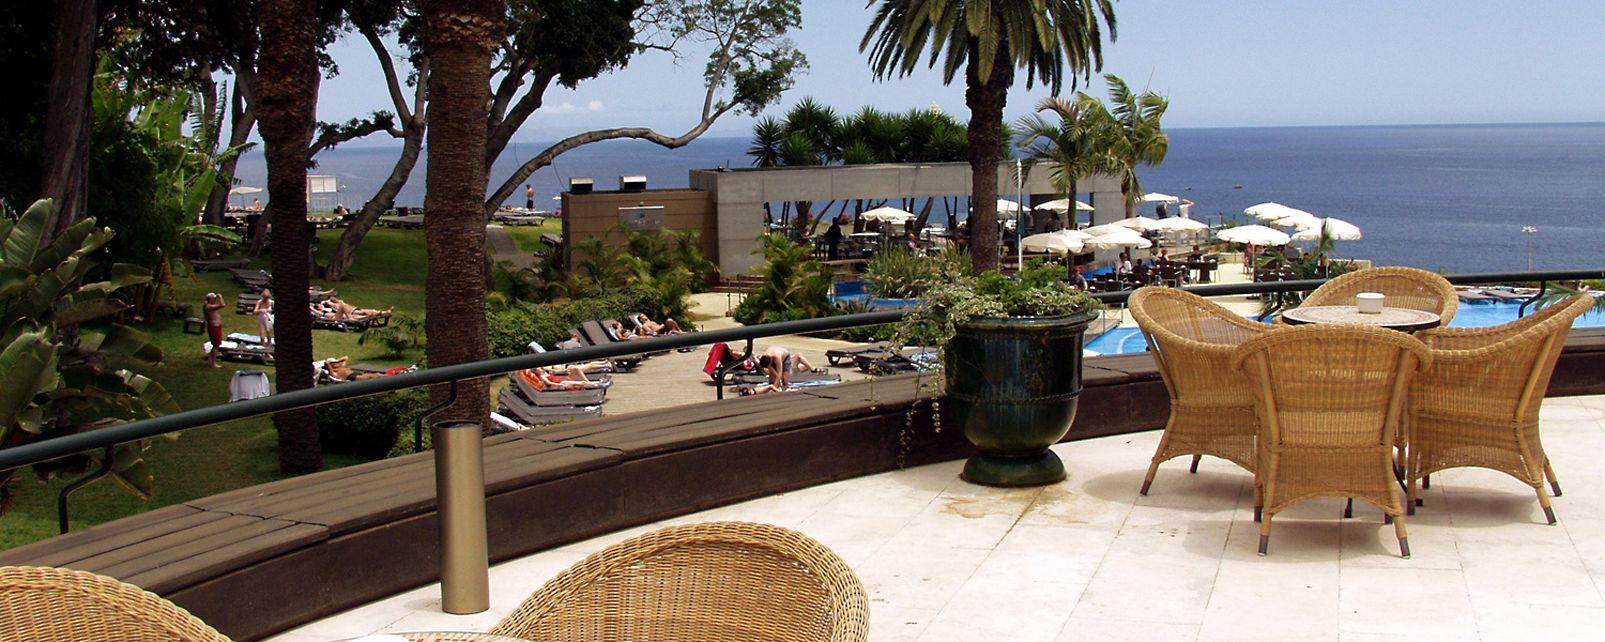 restaurants near pestana casino park funchal